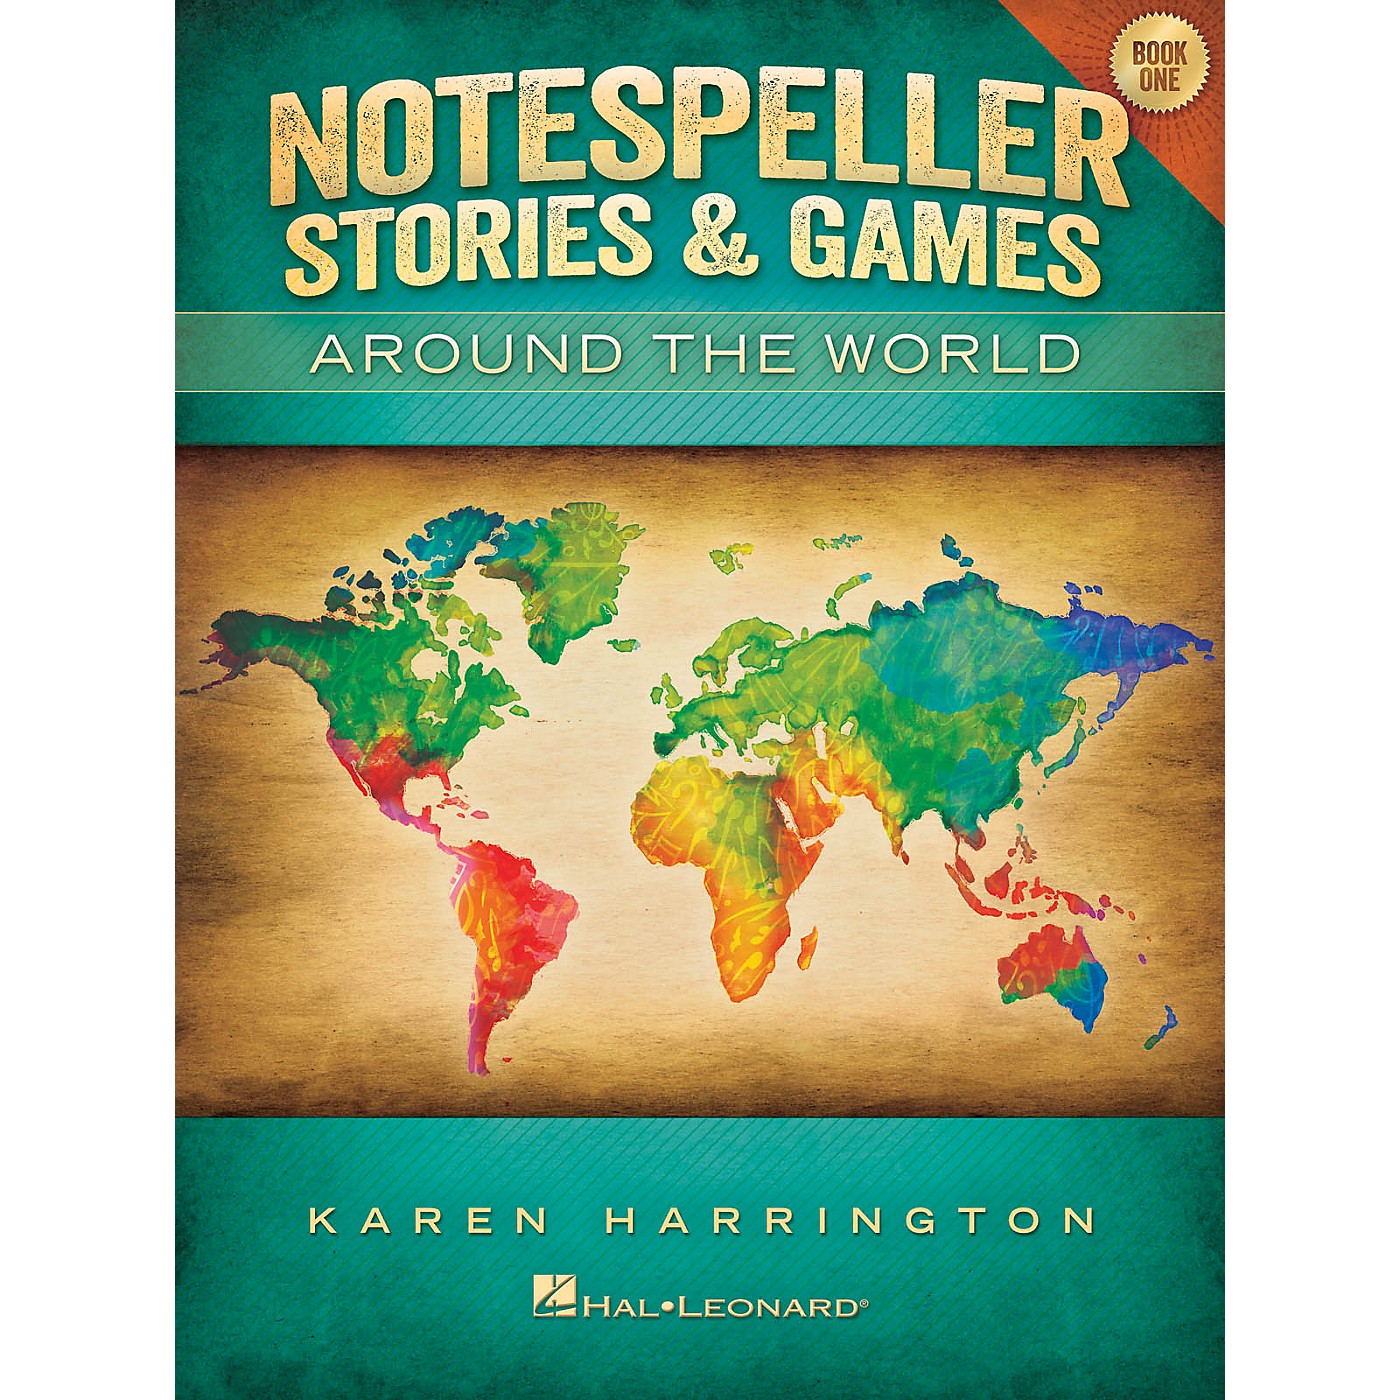 Hal Leonard Notespeller Stories & Games - Book 1 Piano Library Series Book by Karen Harrington (Level Elem) thumbnail